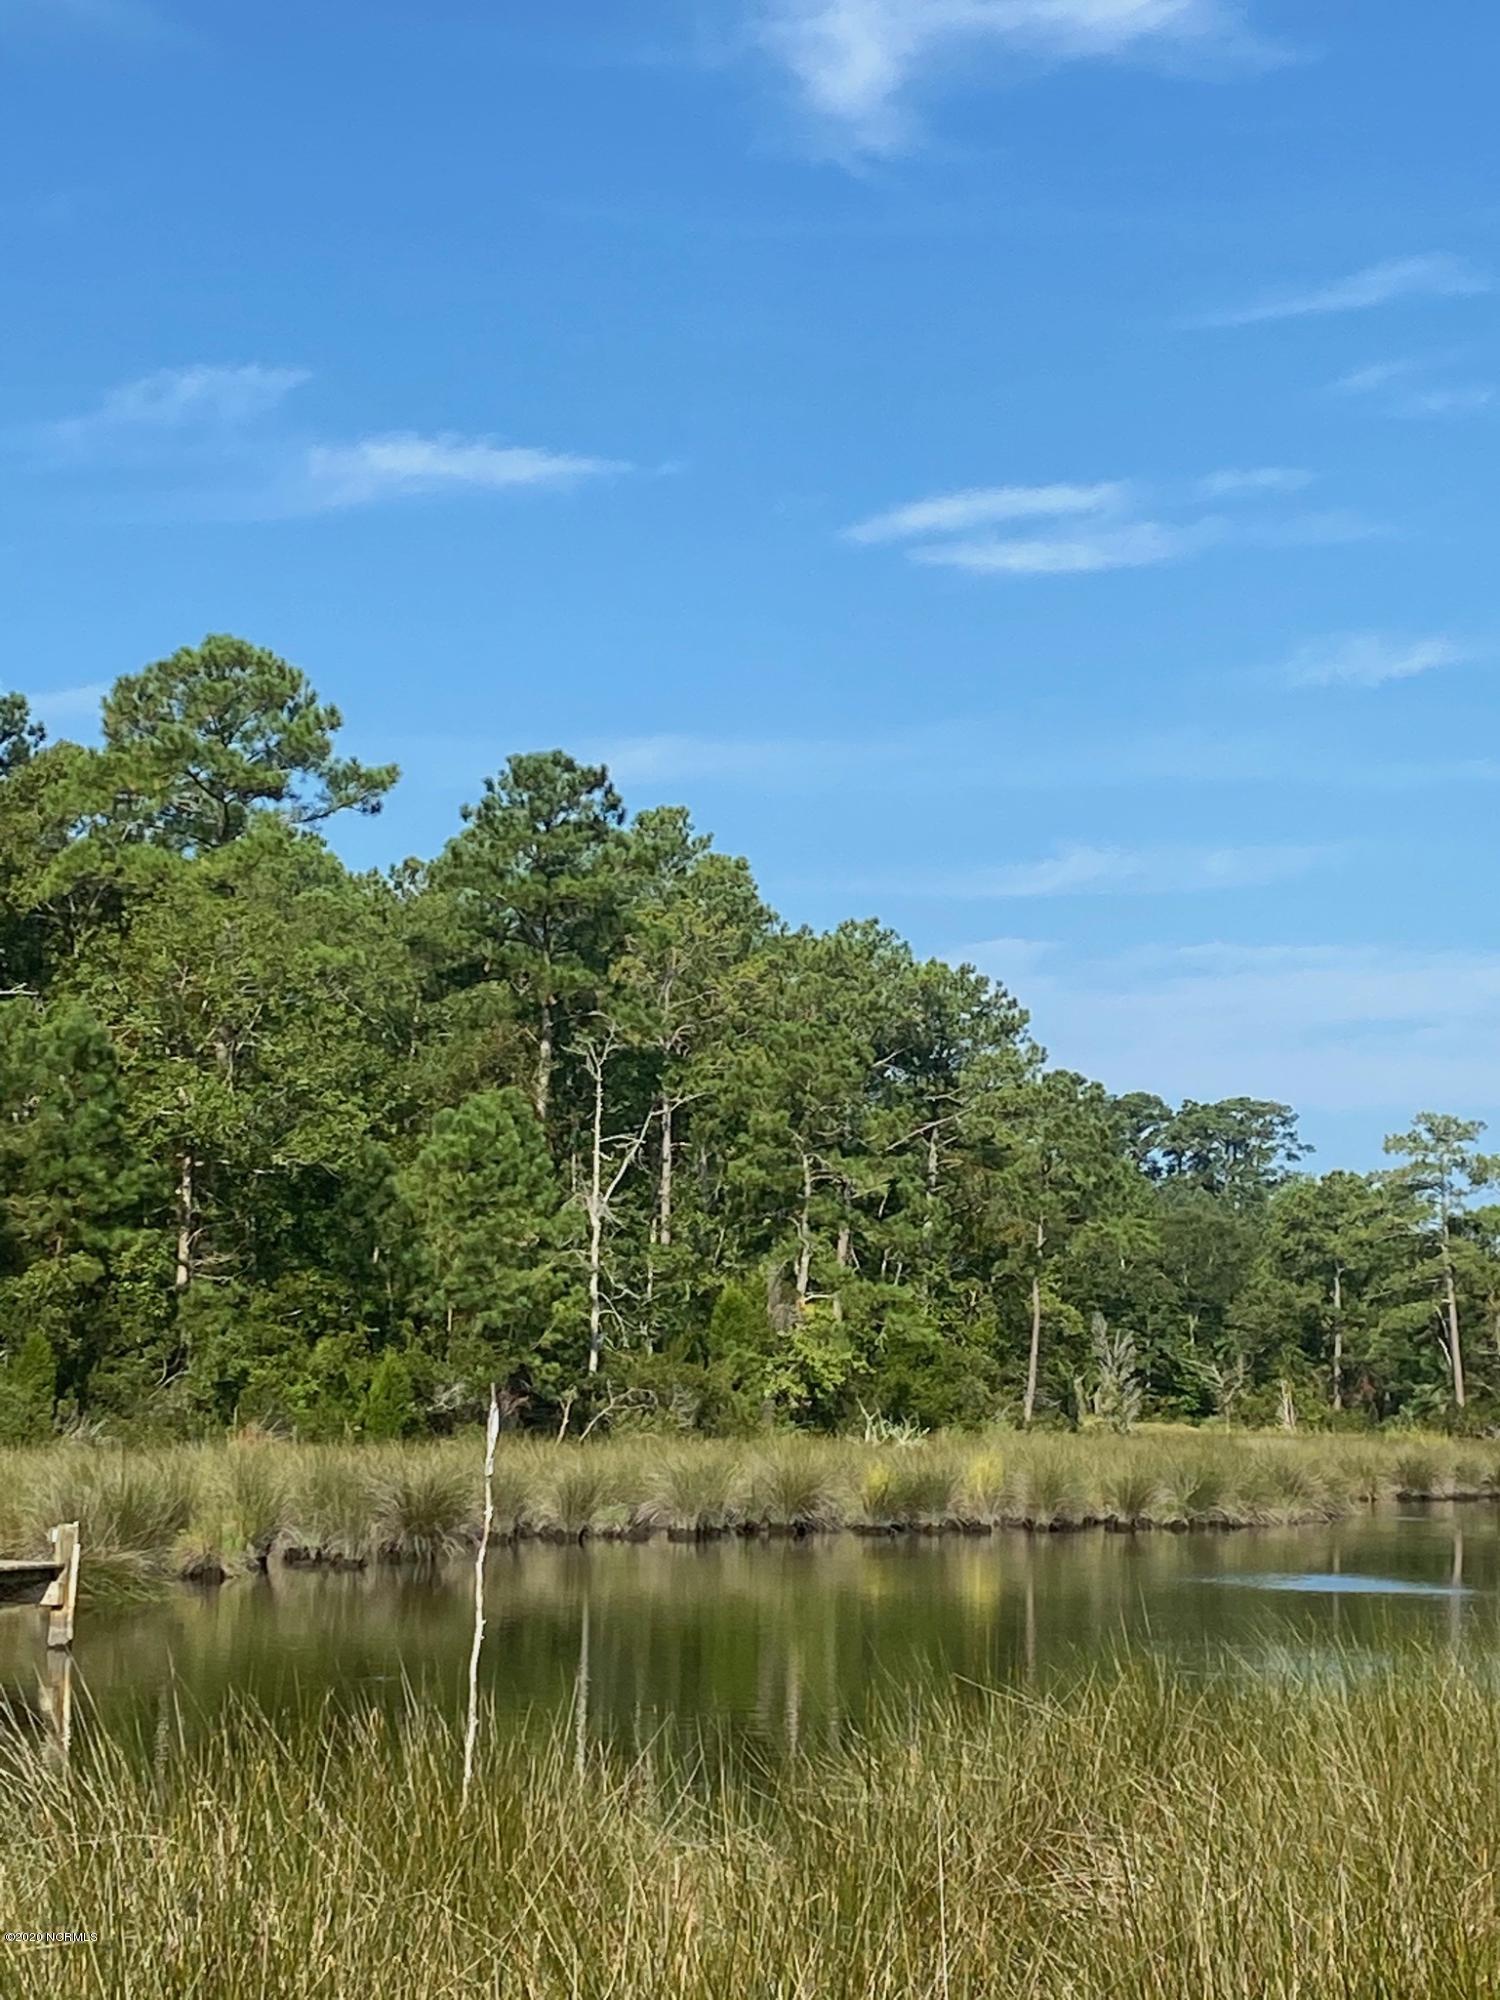 28 Pinecrest Road, Bath, North Carolina 27808, ,Residential land,For sale,Pinecrest,100234573